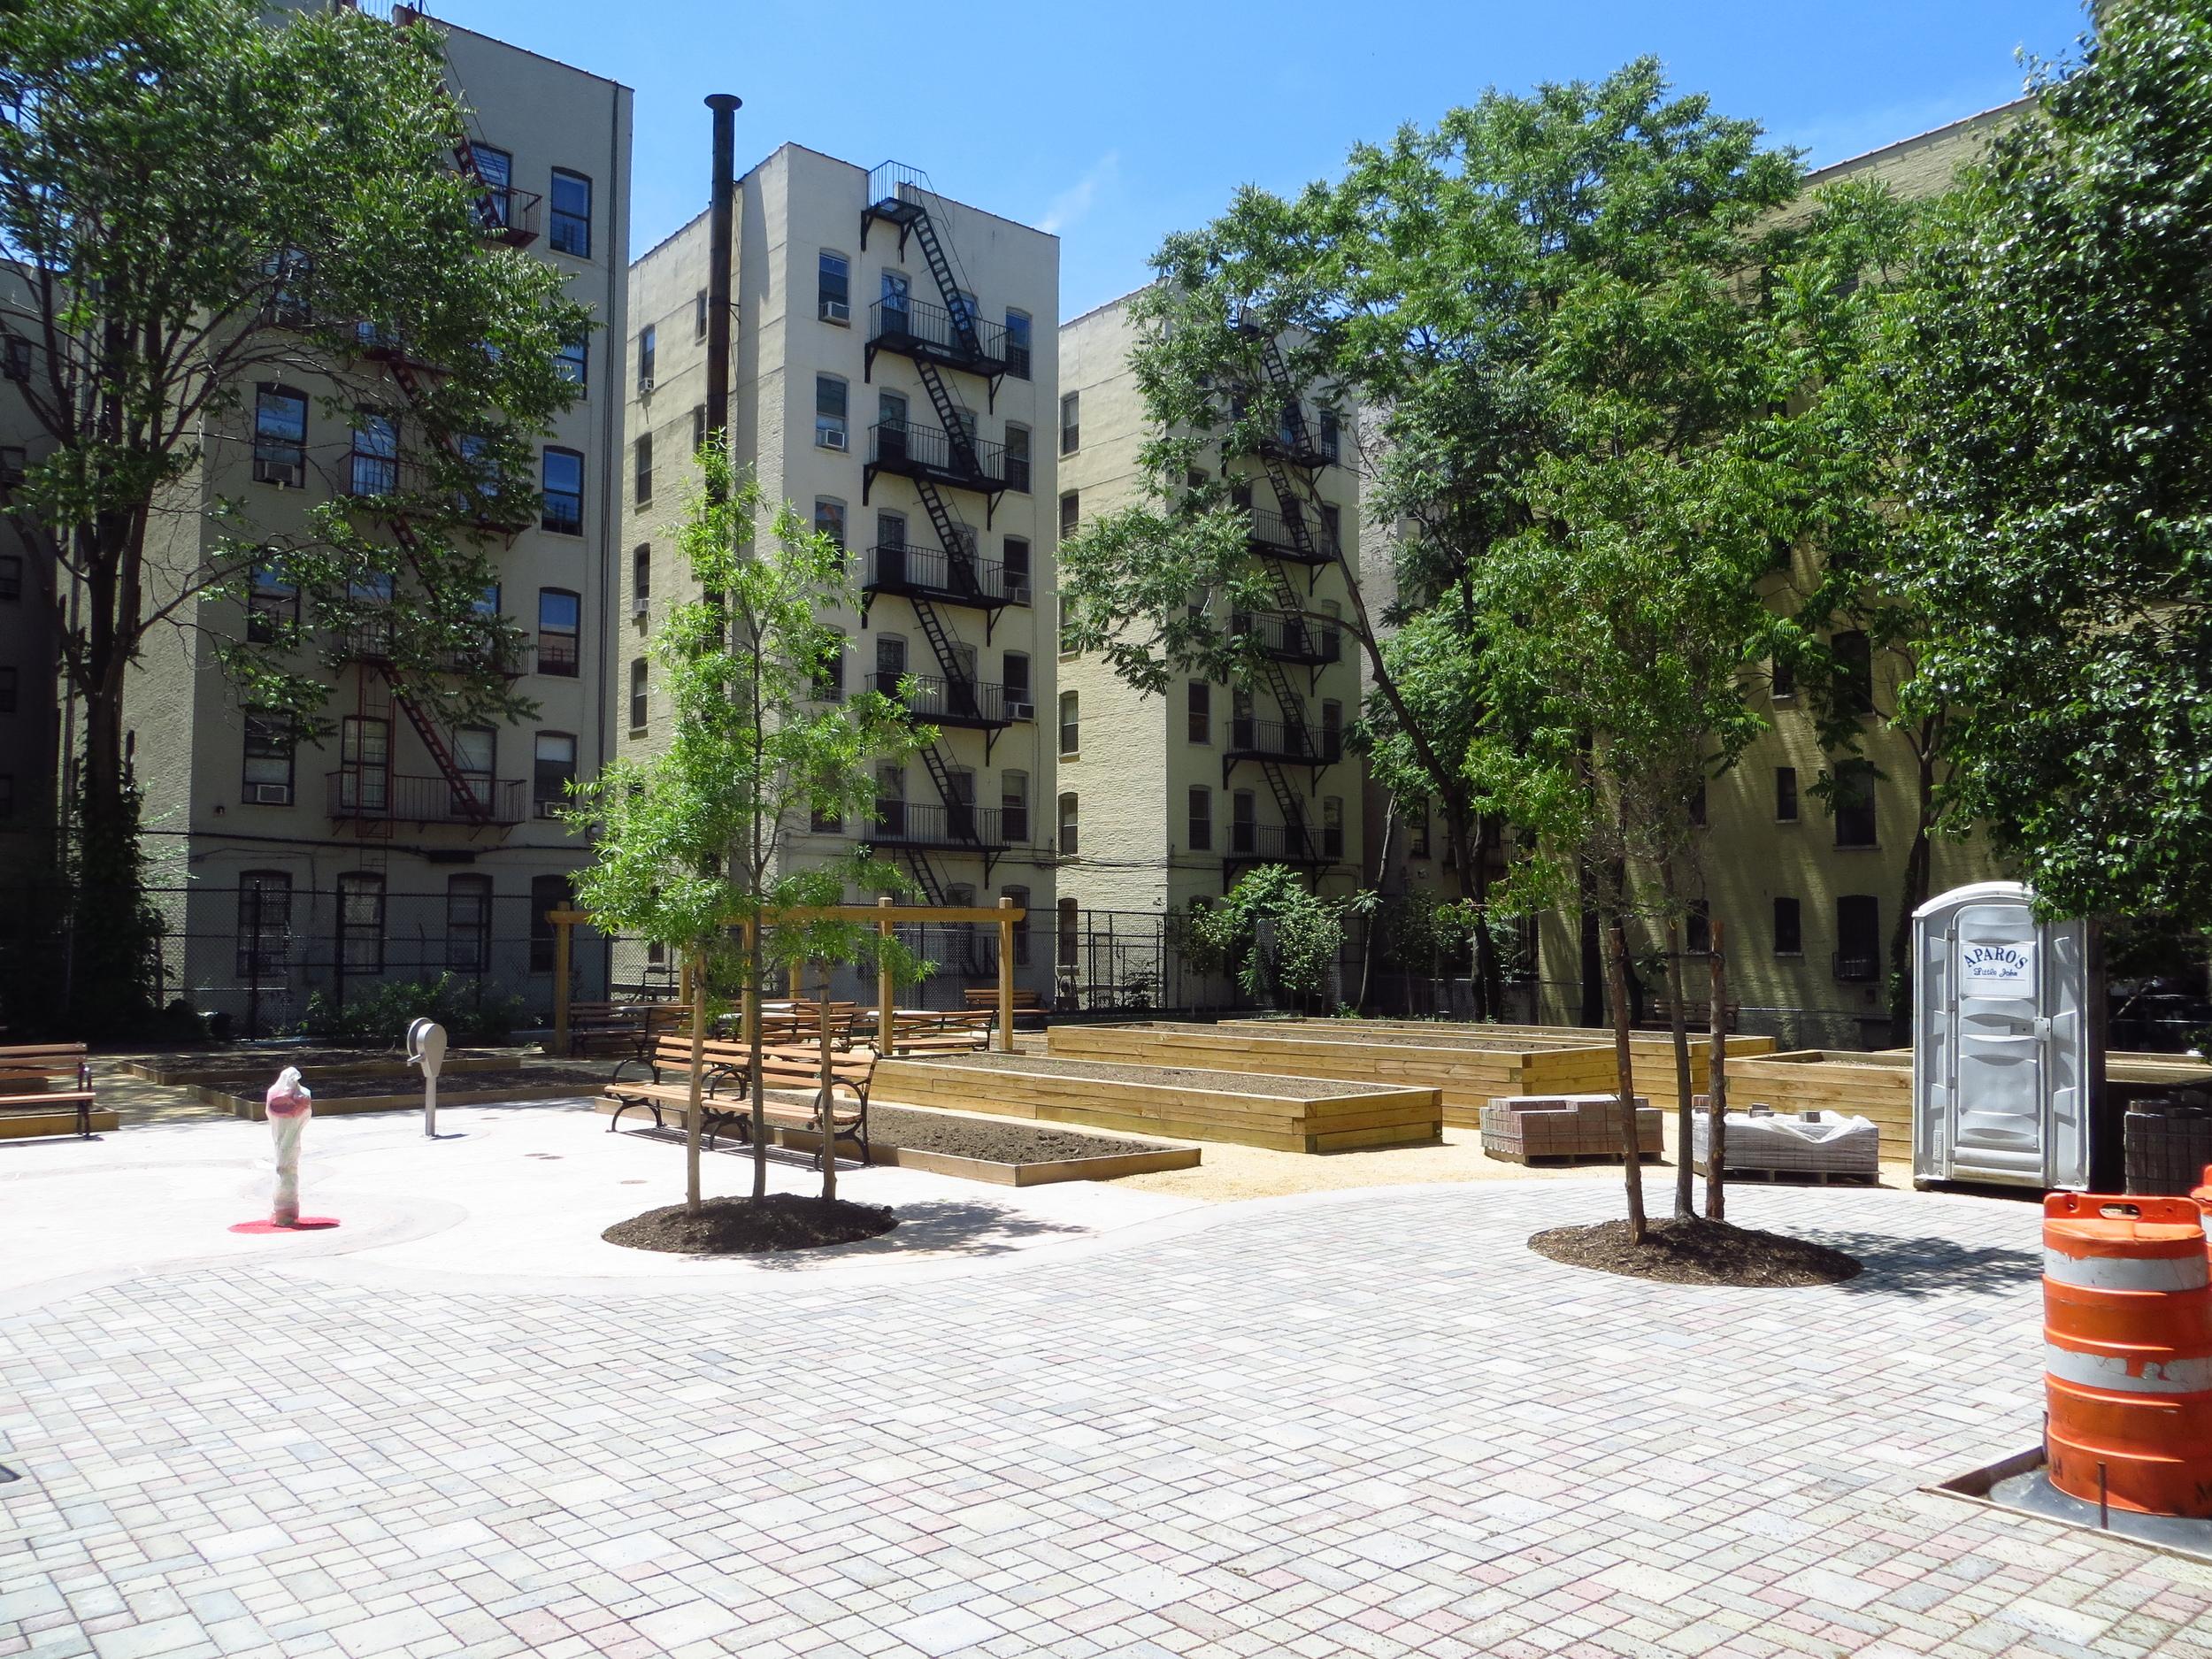 Future community garden